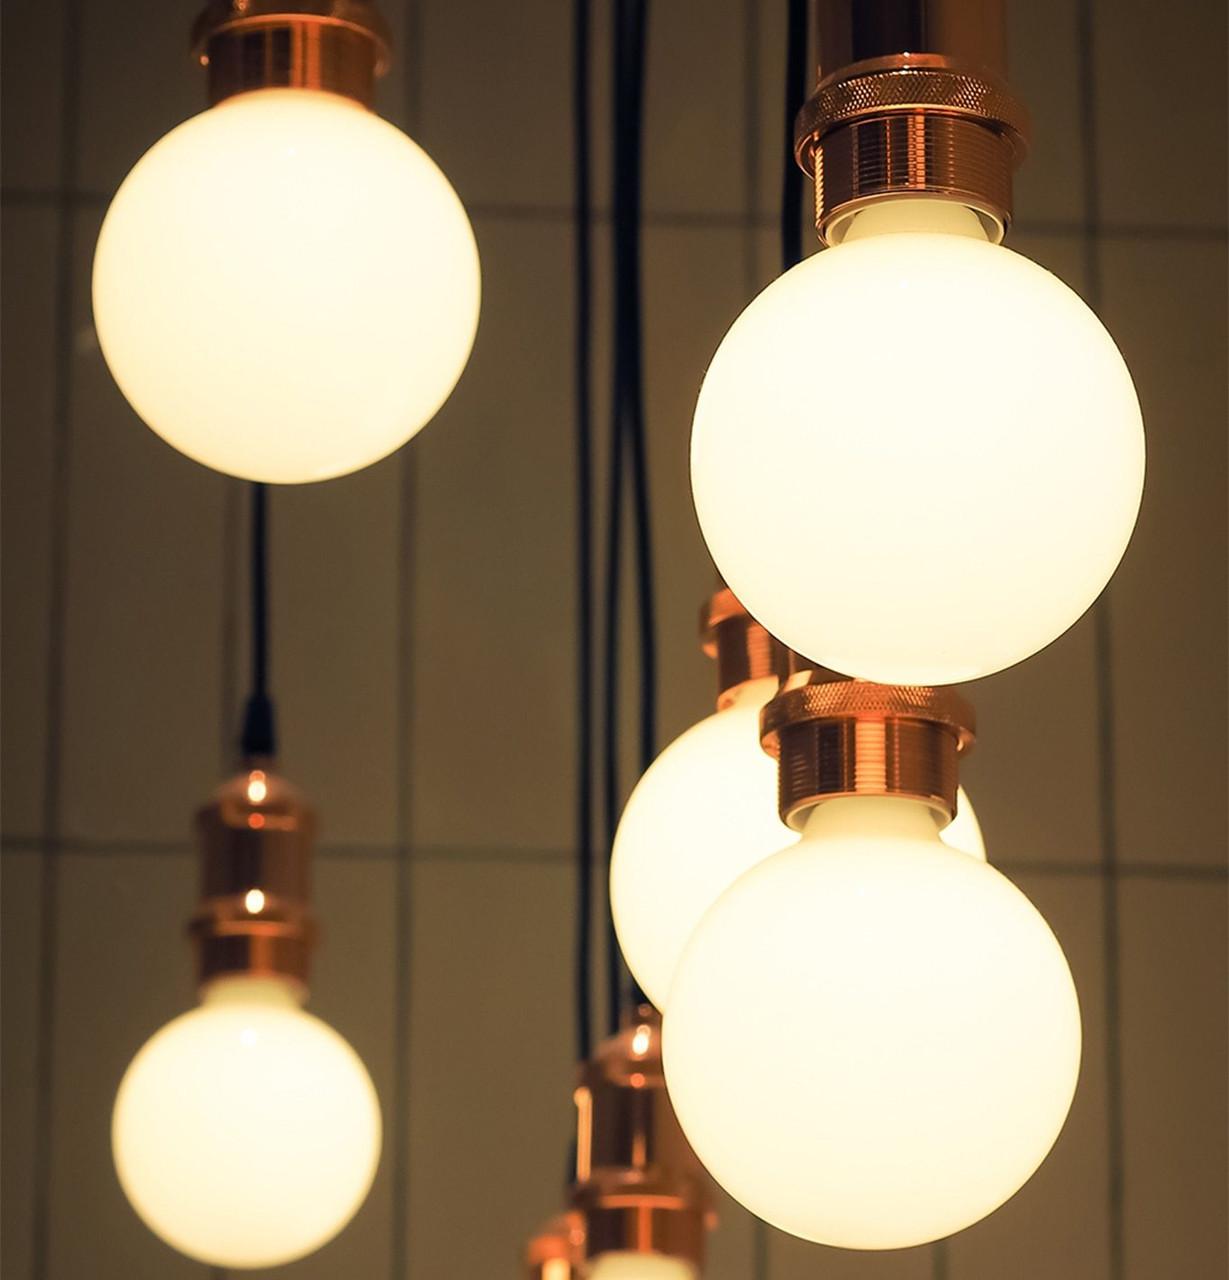 Crompton Lamps LED G125 BC Light Bulbs